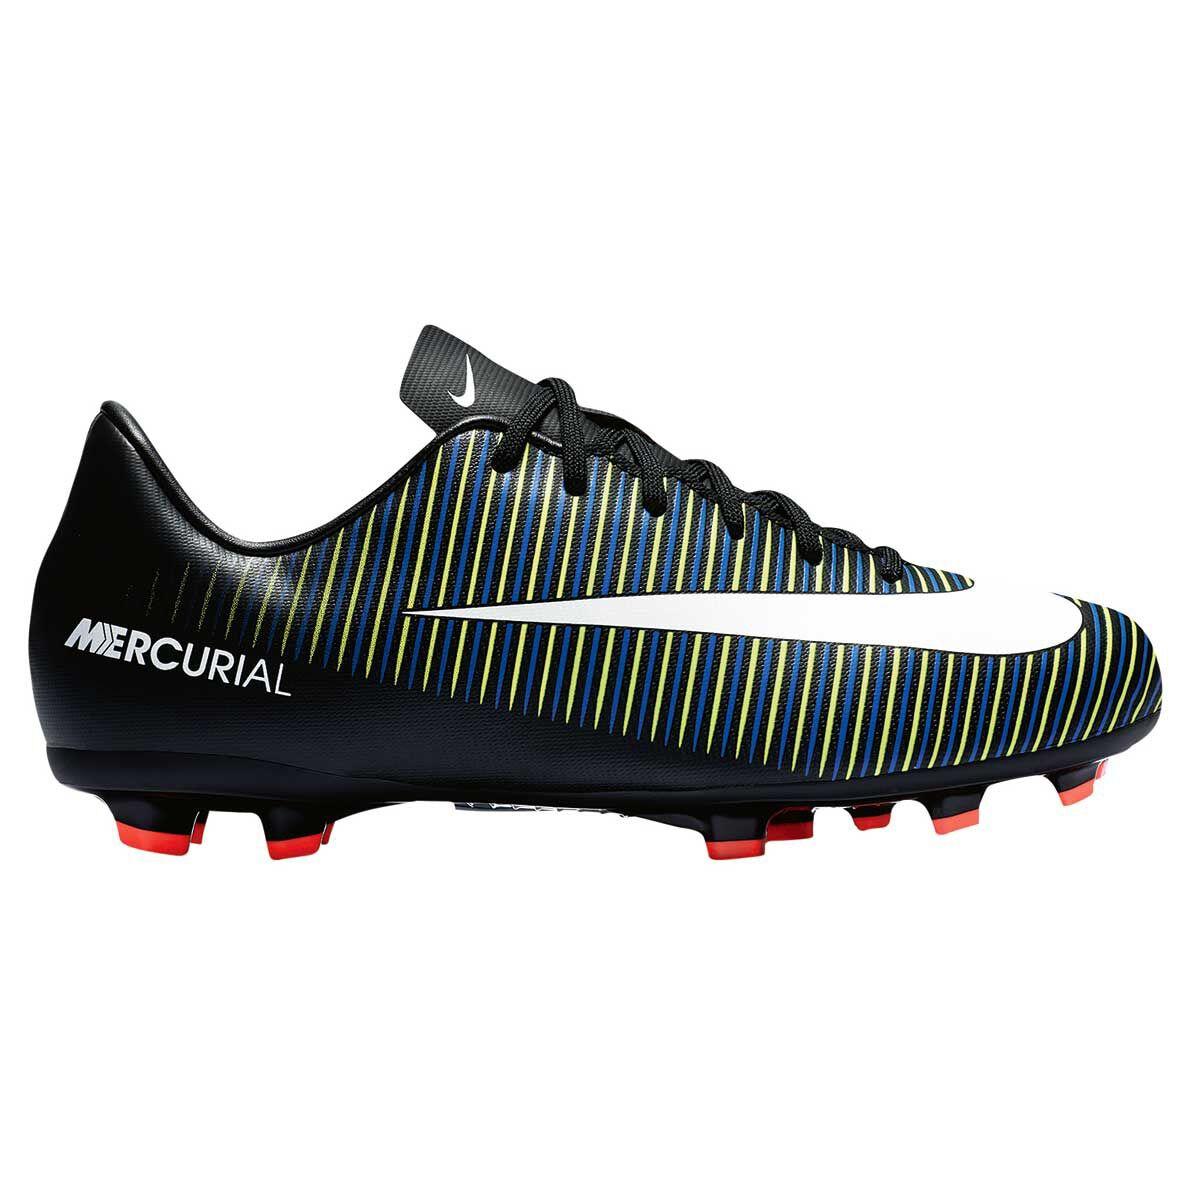 5428db44452 ... germany nike mercurial victory vi junior football boots black white us  3 junior black c8df4 1a615 ...